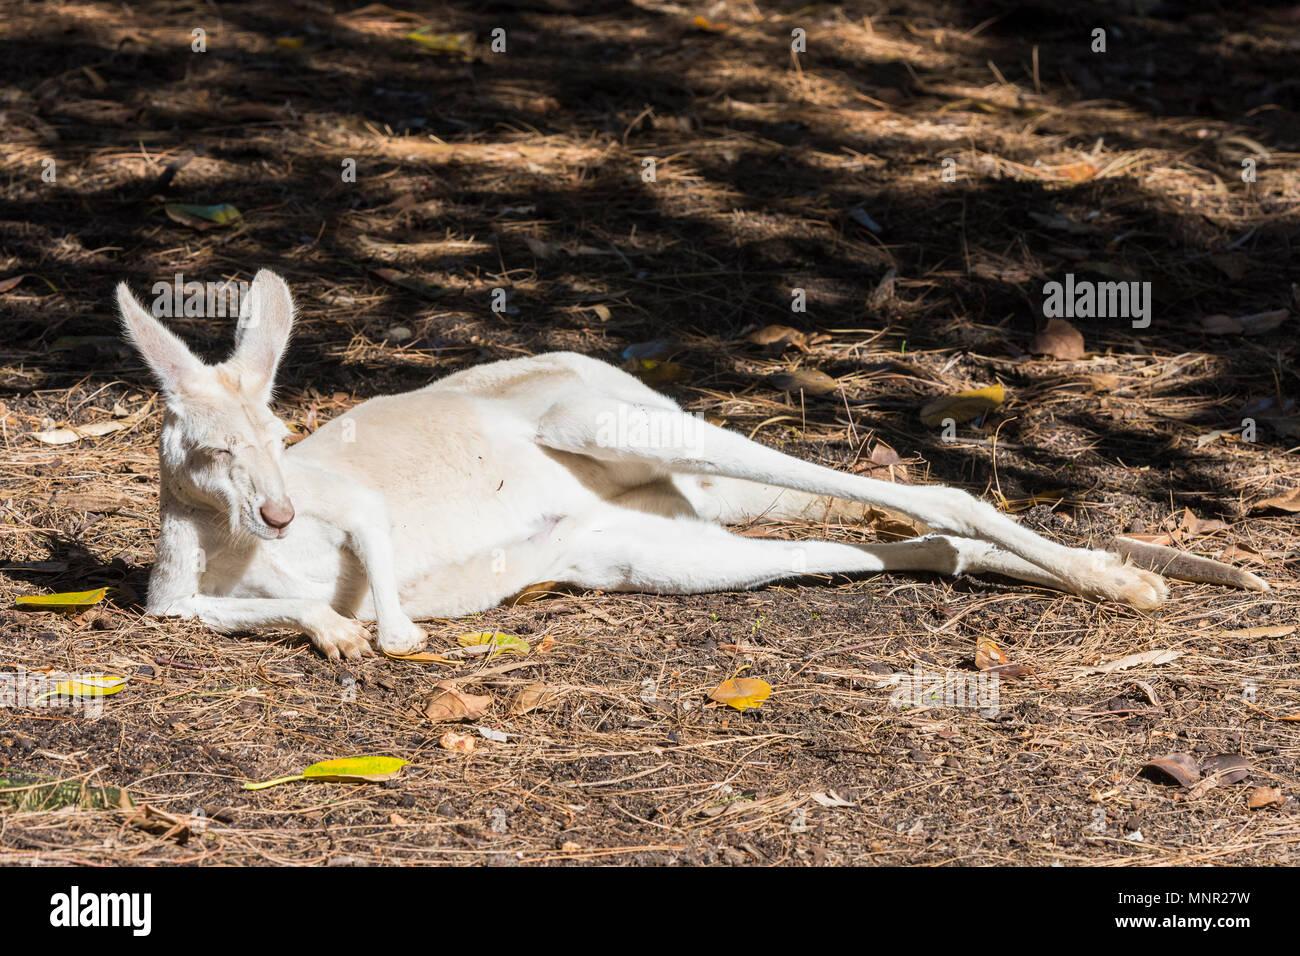 Albino Kangaroo sleeping in the sun at Perth Zoo, South Perth, Western Australia - Stock Image